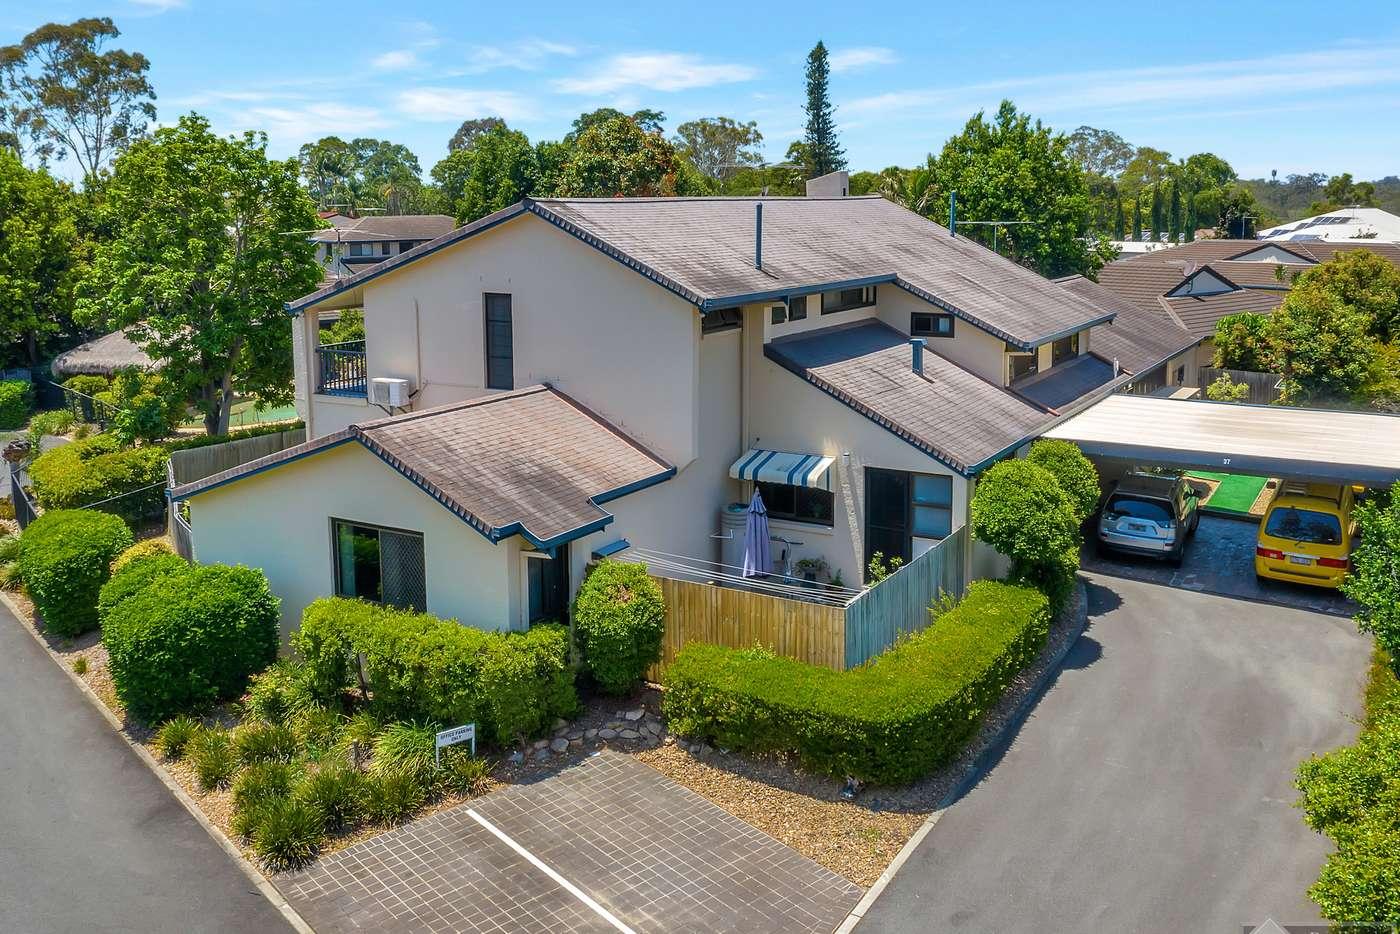 Sixth view of Homely house listing, 37/239-249 Mooroondu Road, Thorneside QLD 4158